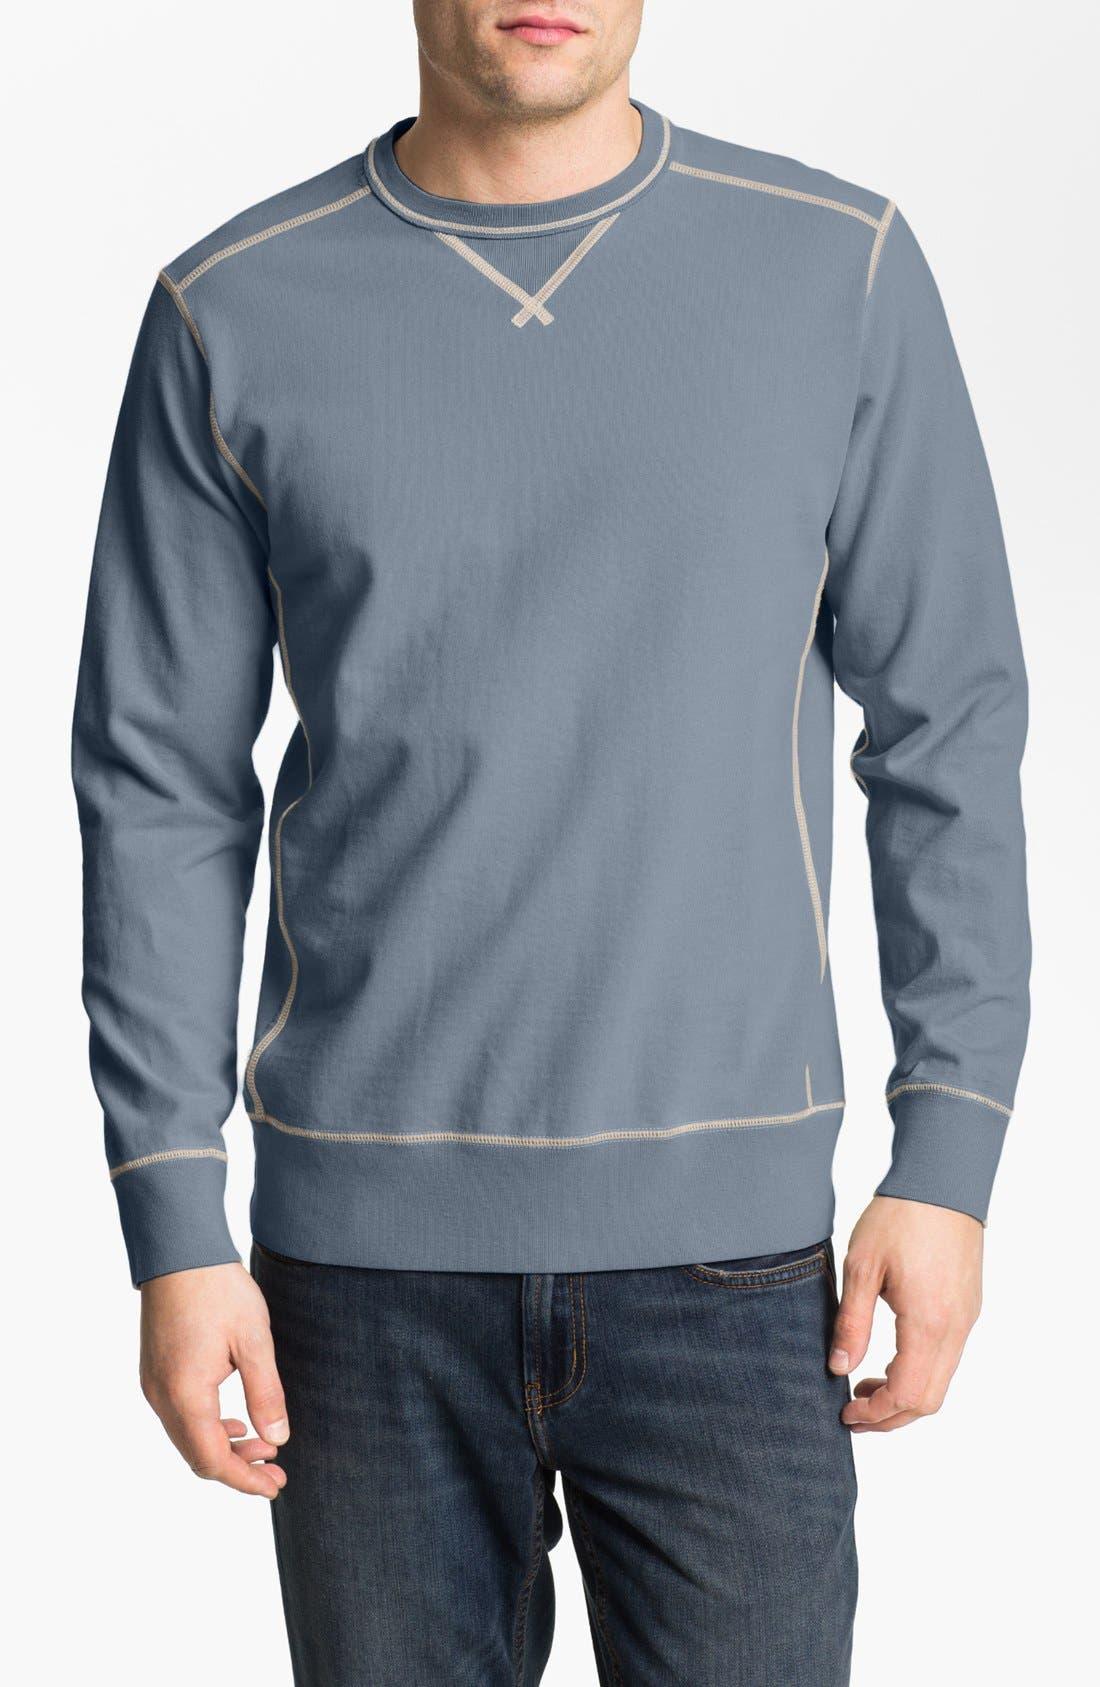 Alternate Image 1 Selected - Tommy Bahama Denim 'Catamaran Crew' Crewneck Sweatshirt